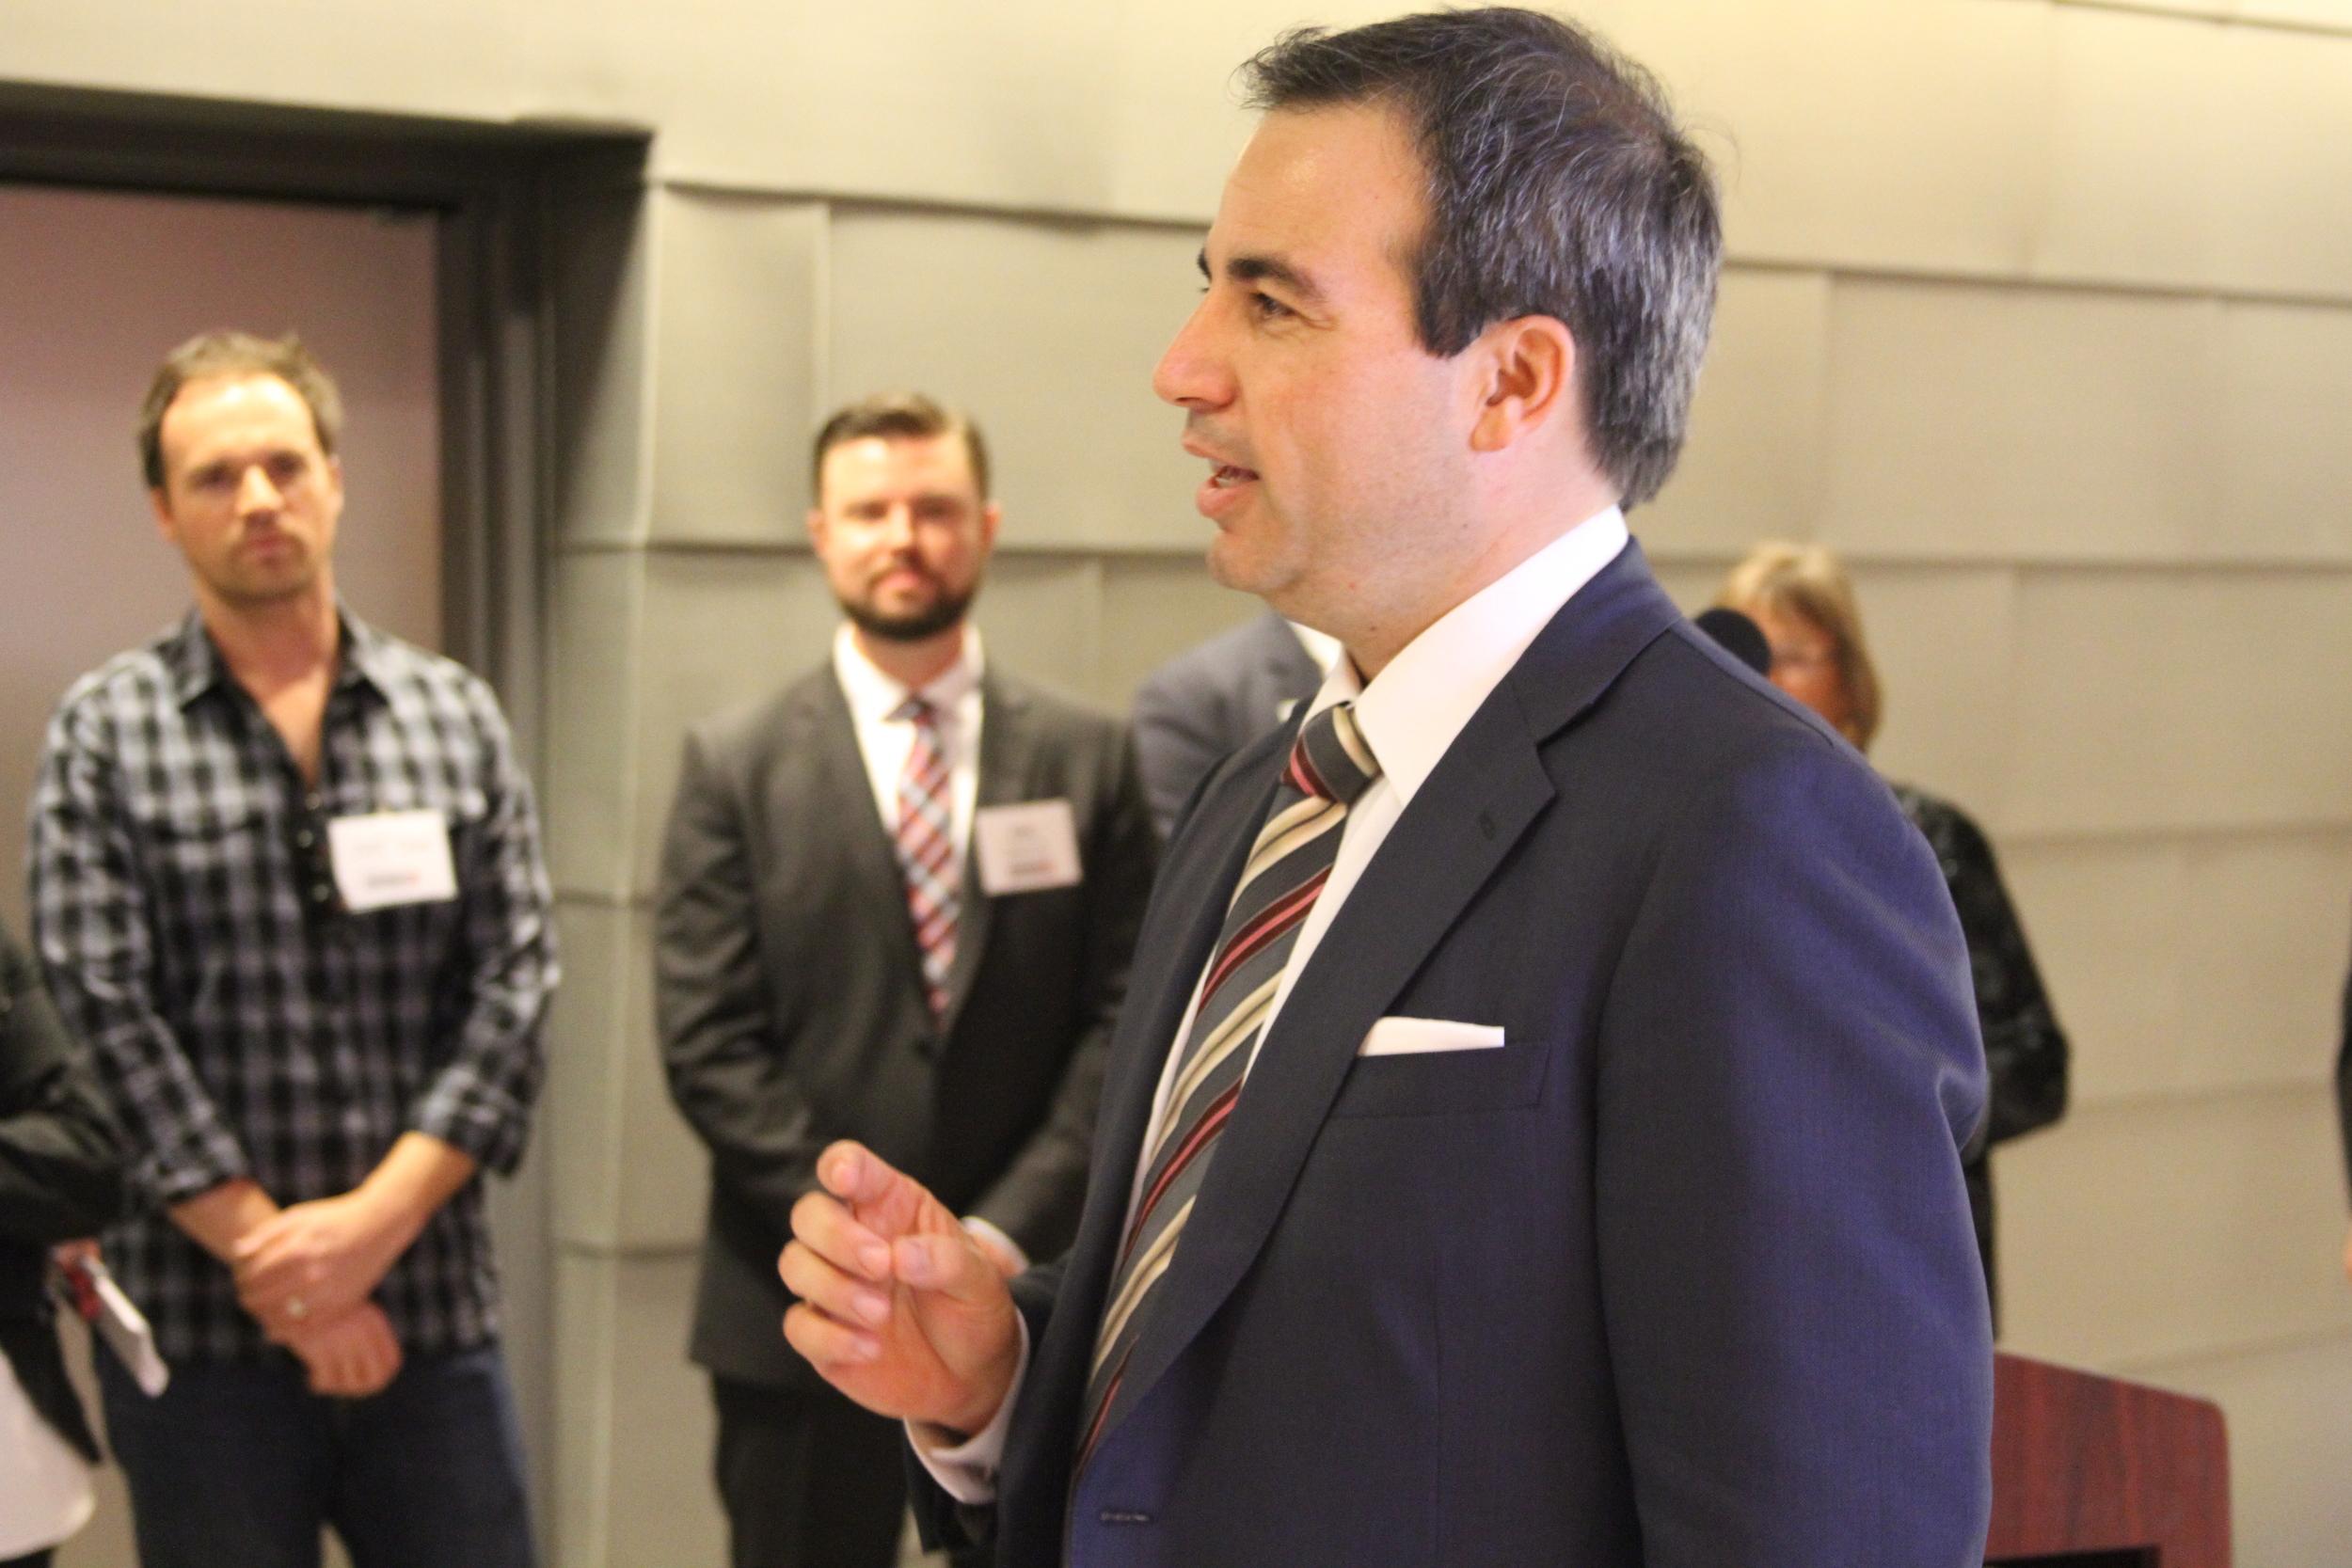 Sinan Kanatsiz, Founder and Chairman of Chapman50